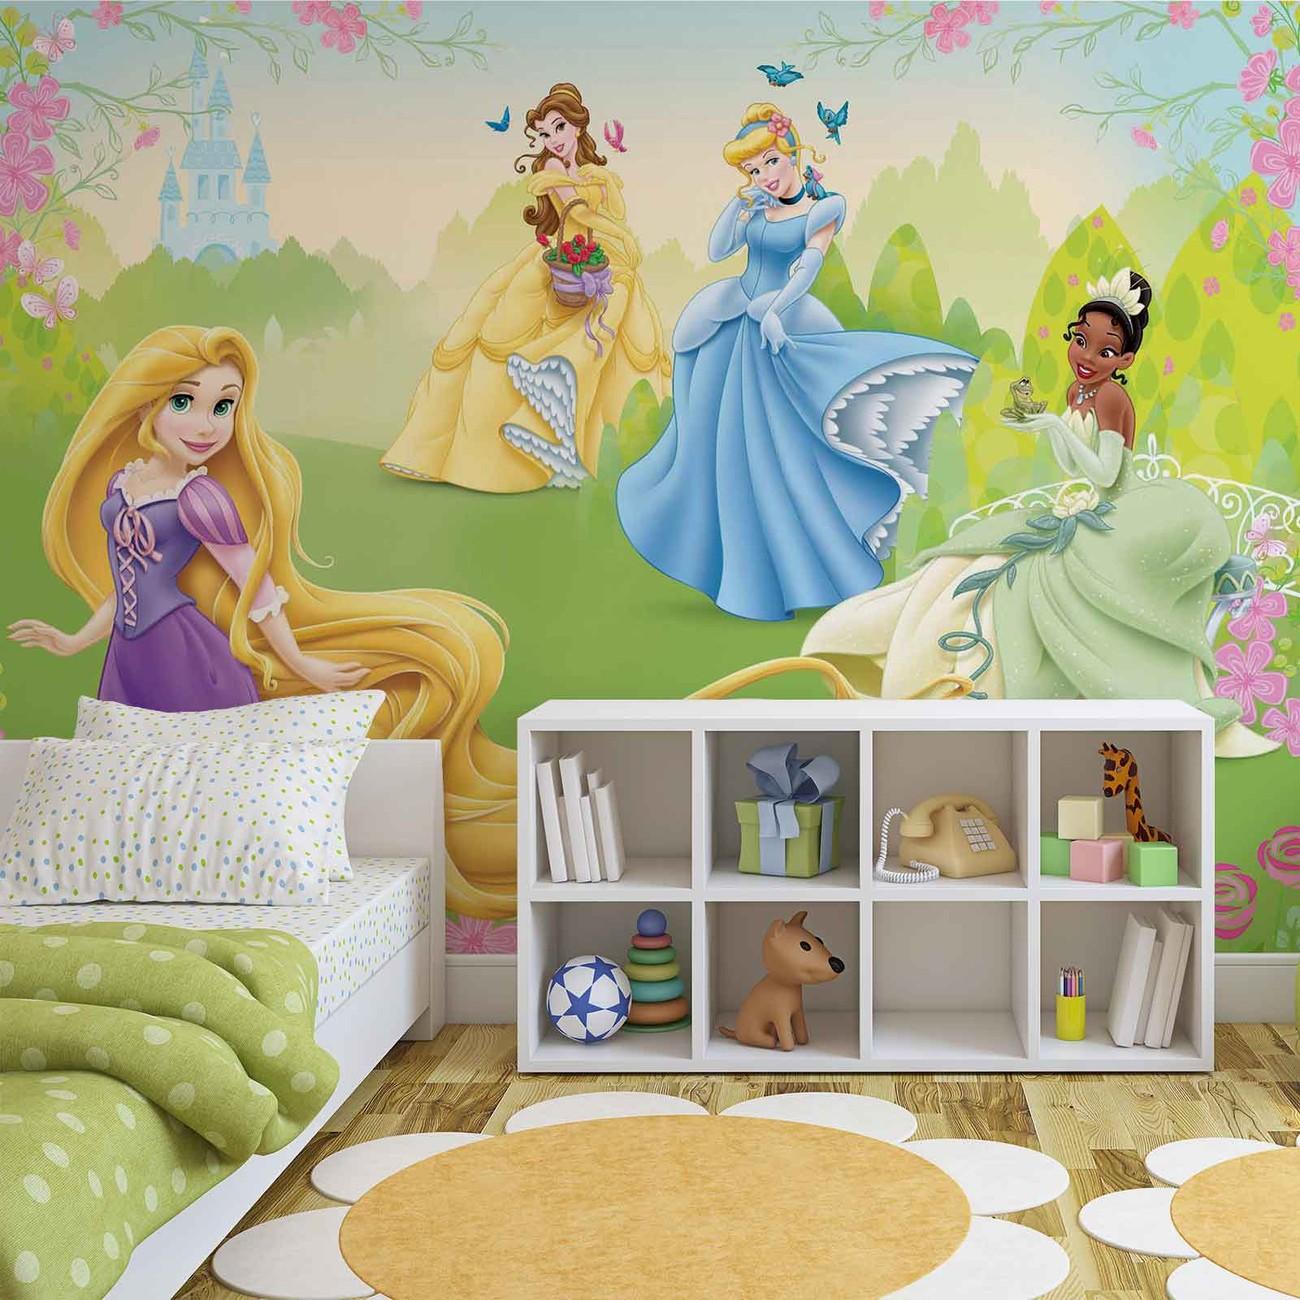 Fotomurale princesas de disney rapunzel tiana belle papel for Papel pintado disney